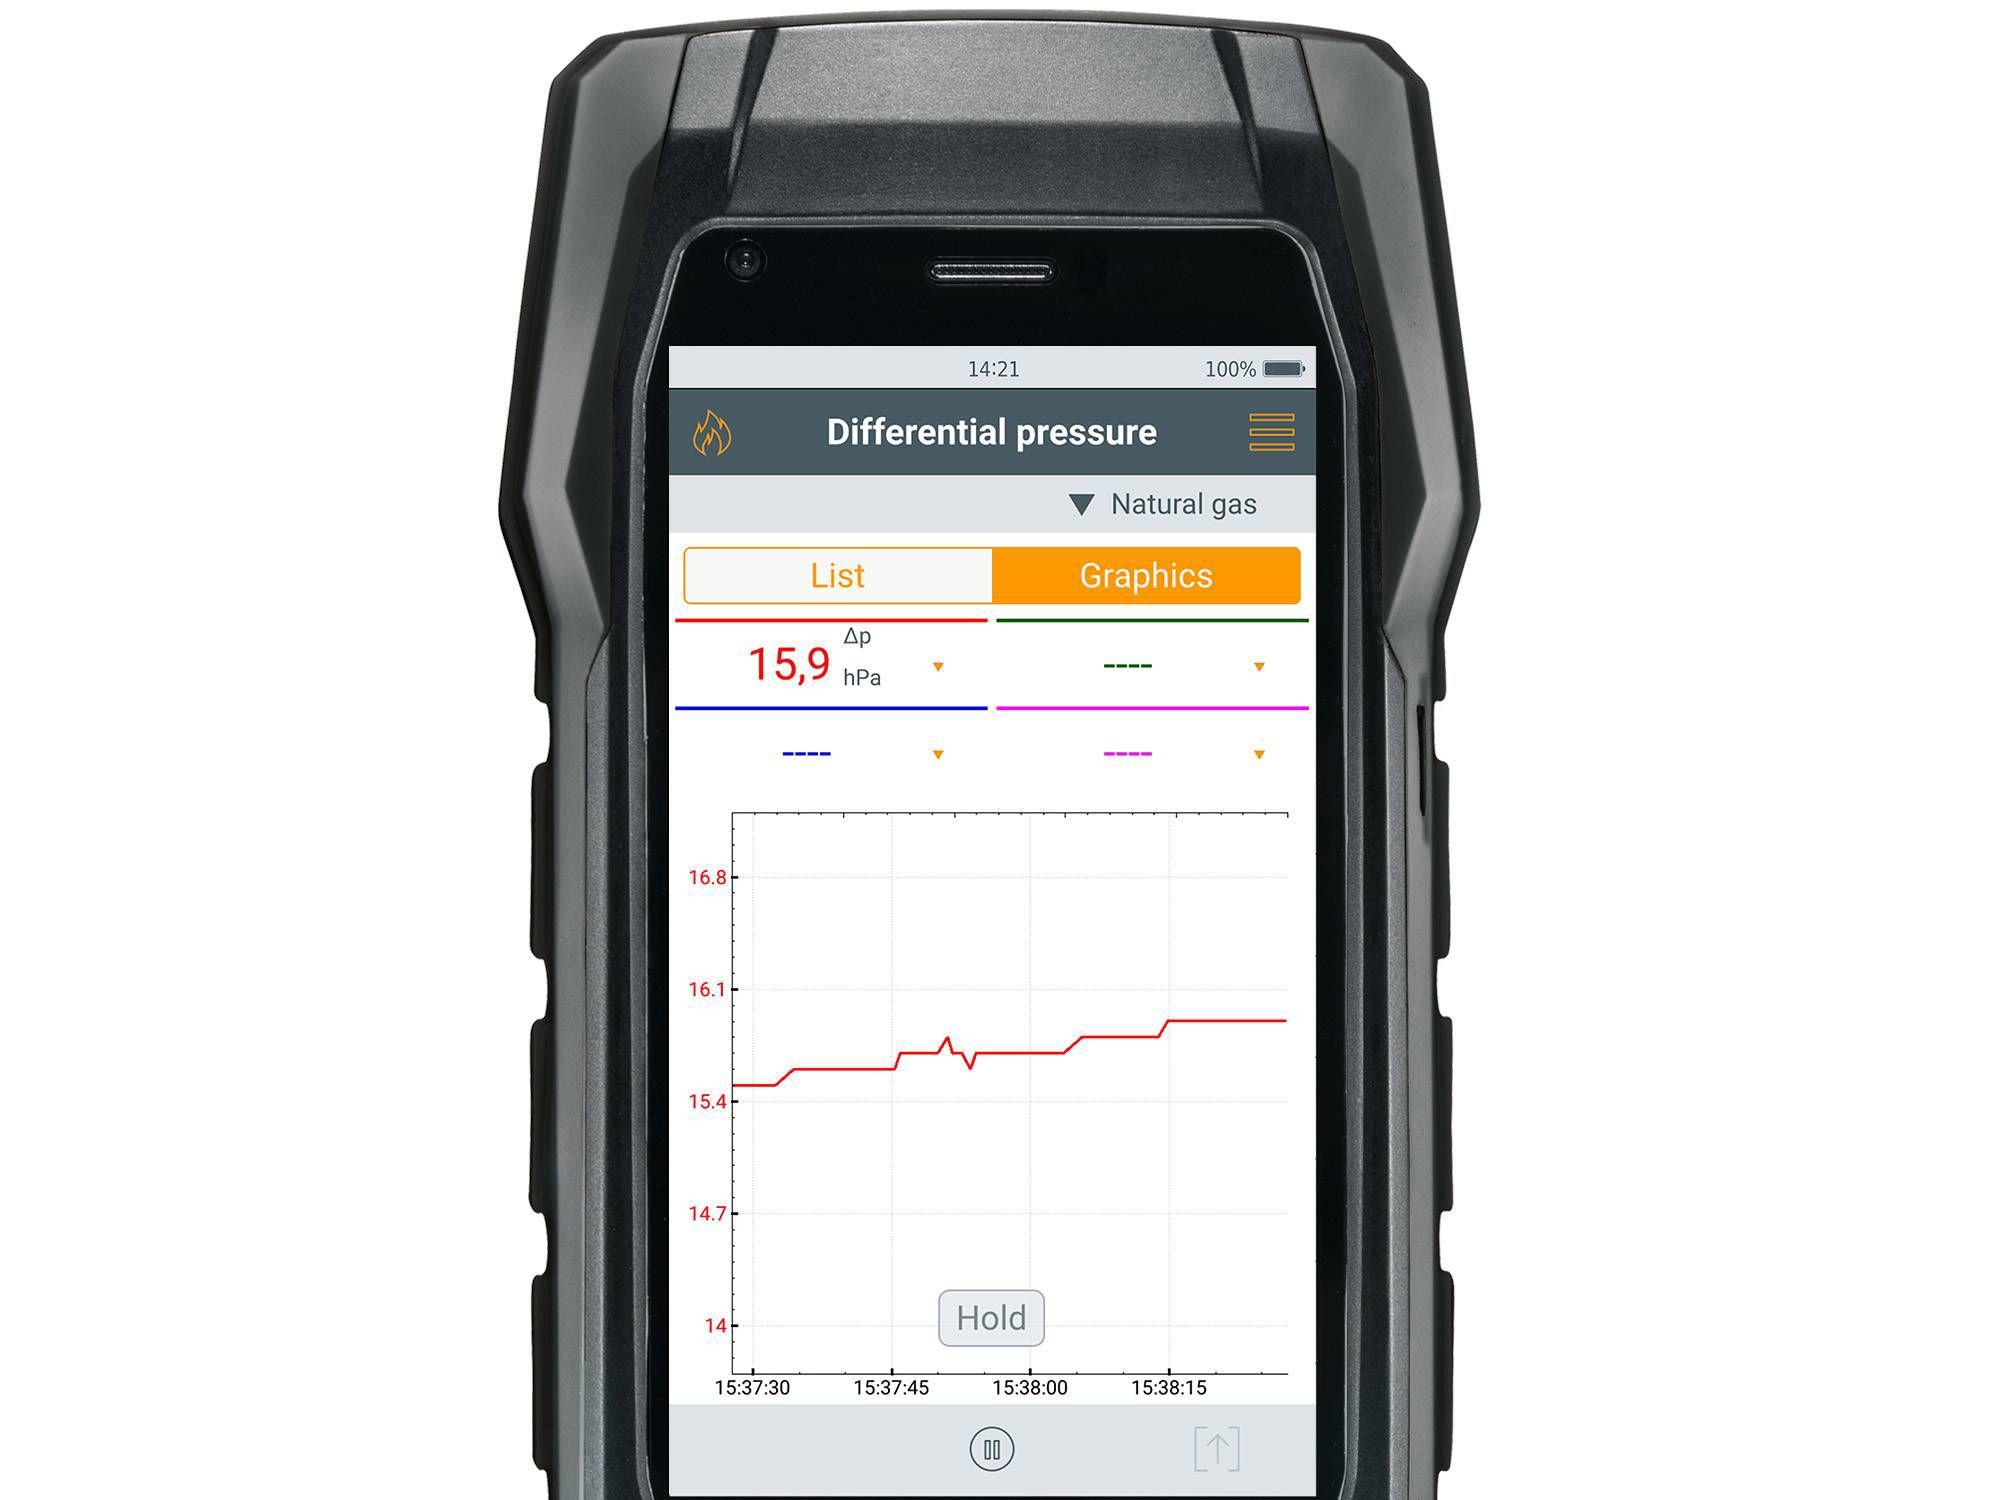 Testo differential pressure measurement